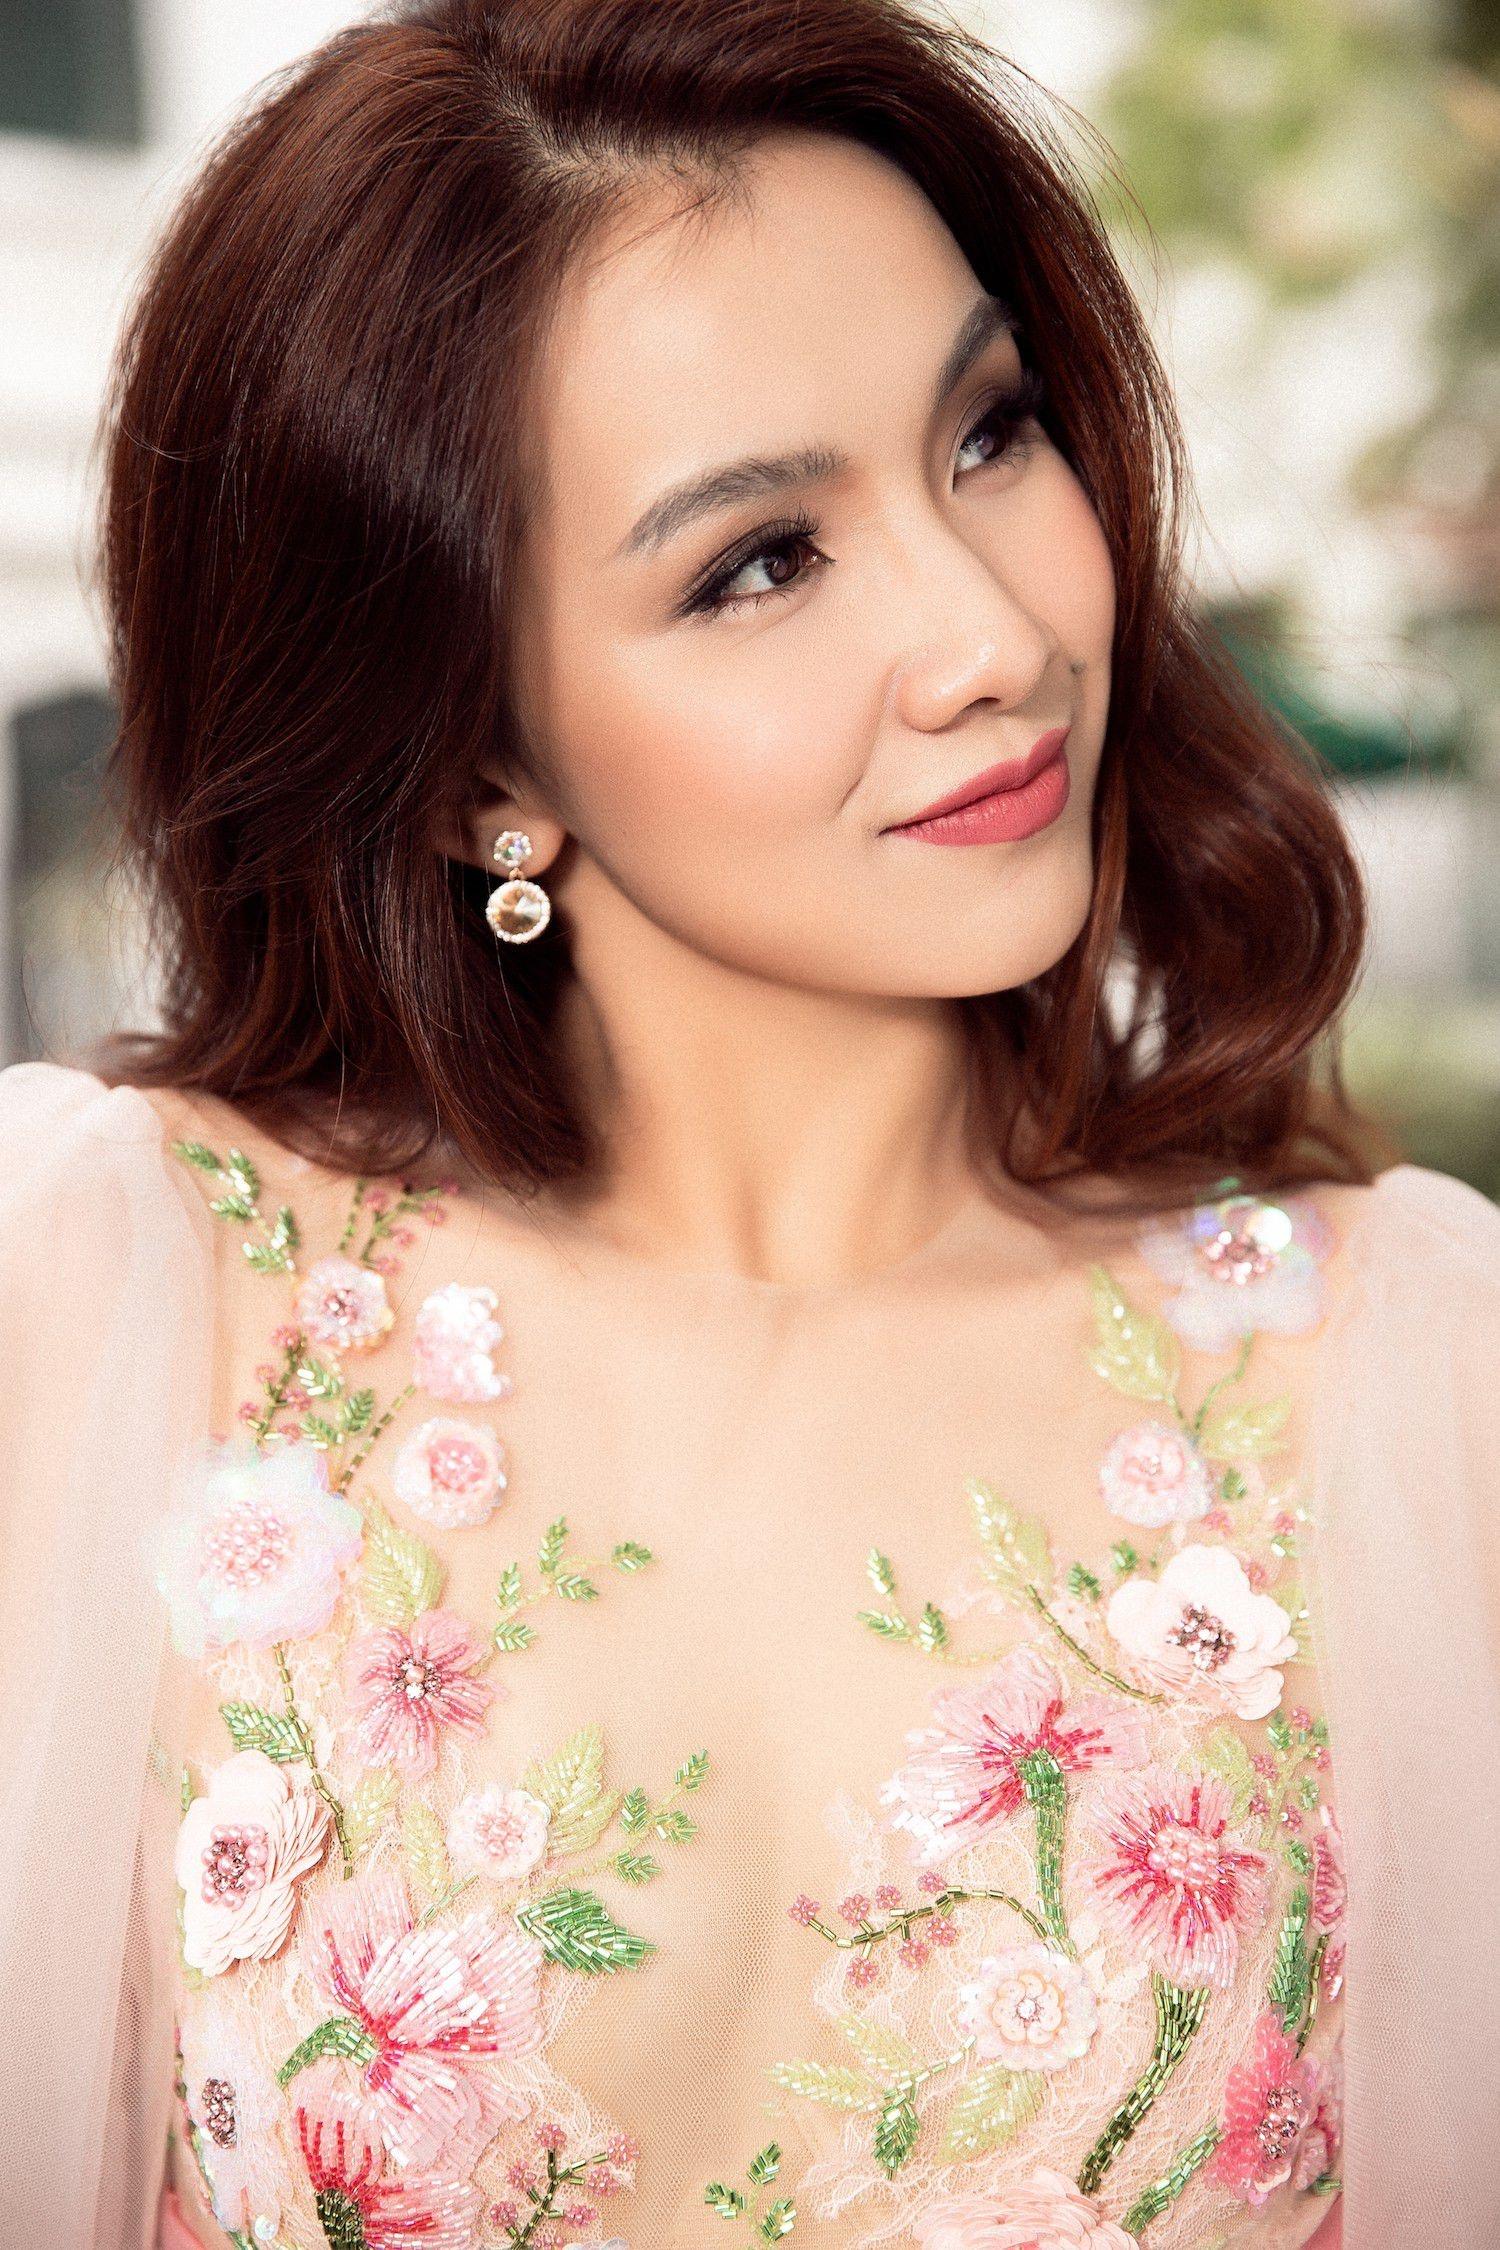 So phan khac biet cua 3 my nhan dang quang Hoa hau Hoan vu Viet Nam hinh anh 20